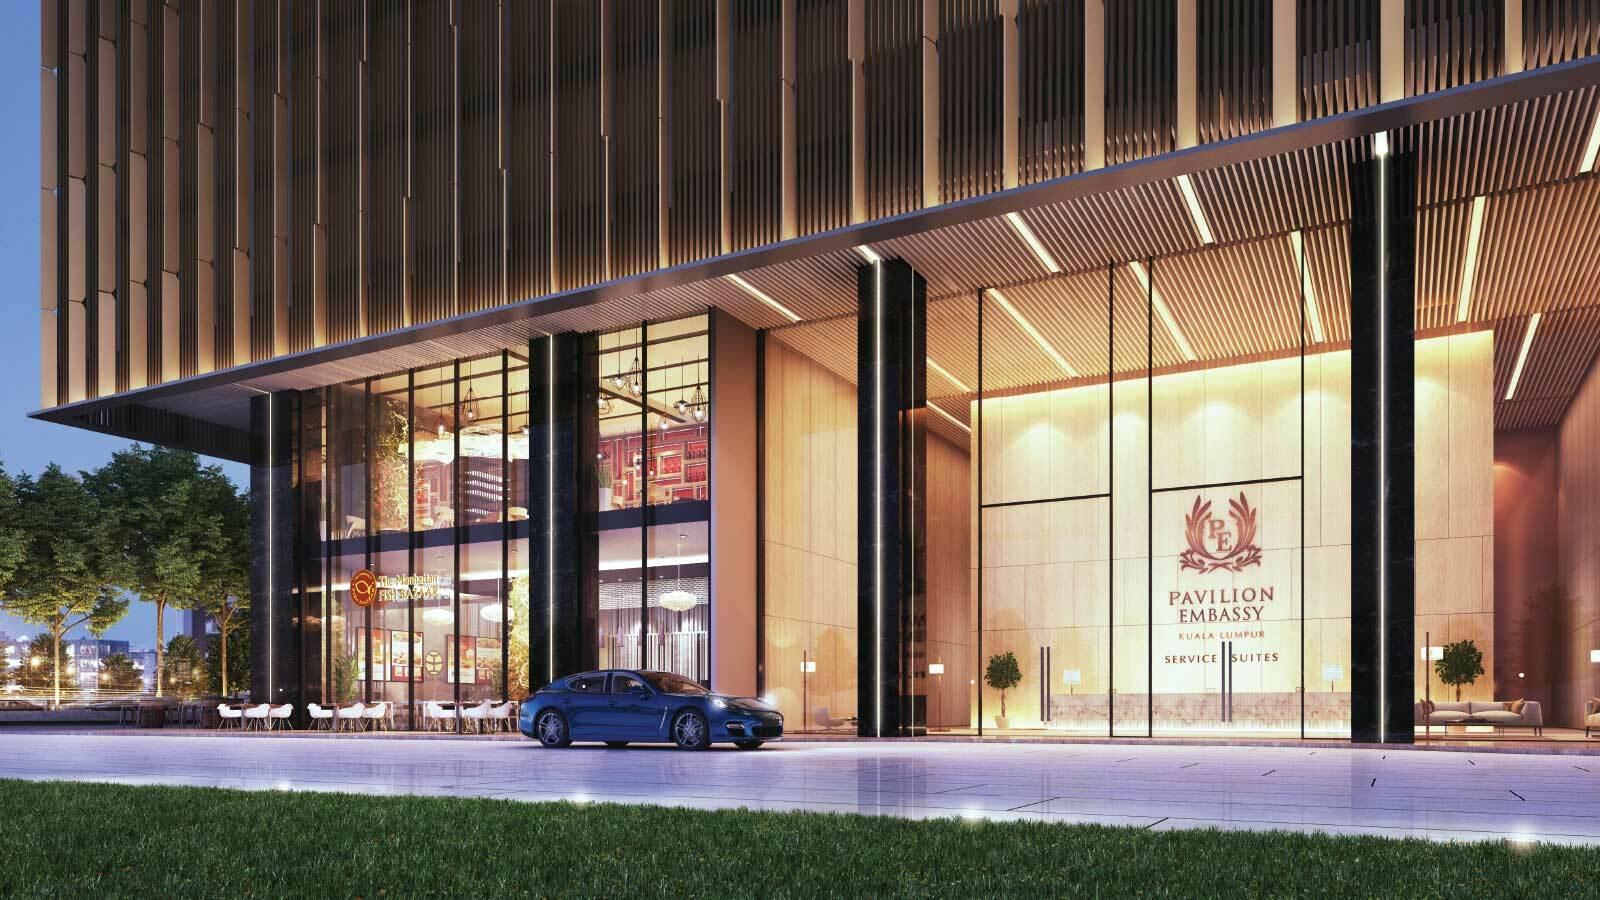 For Sale - Pavilion Embassy Kuala Lumpur